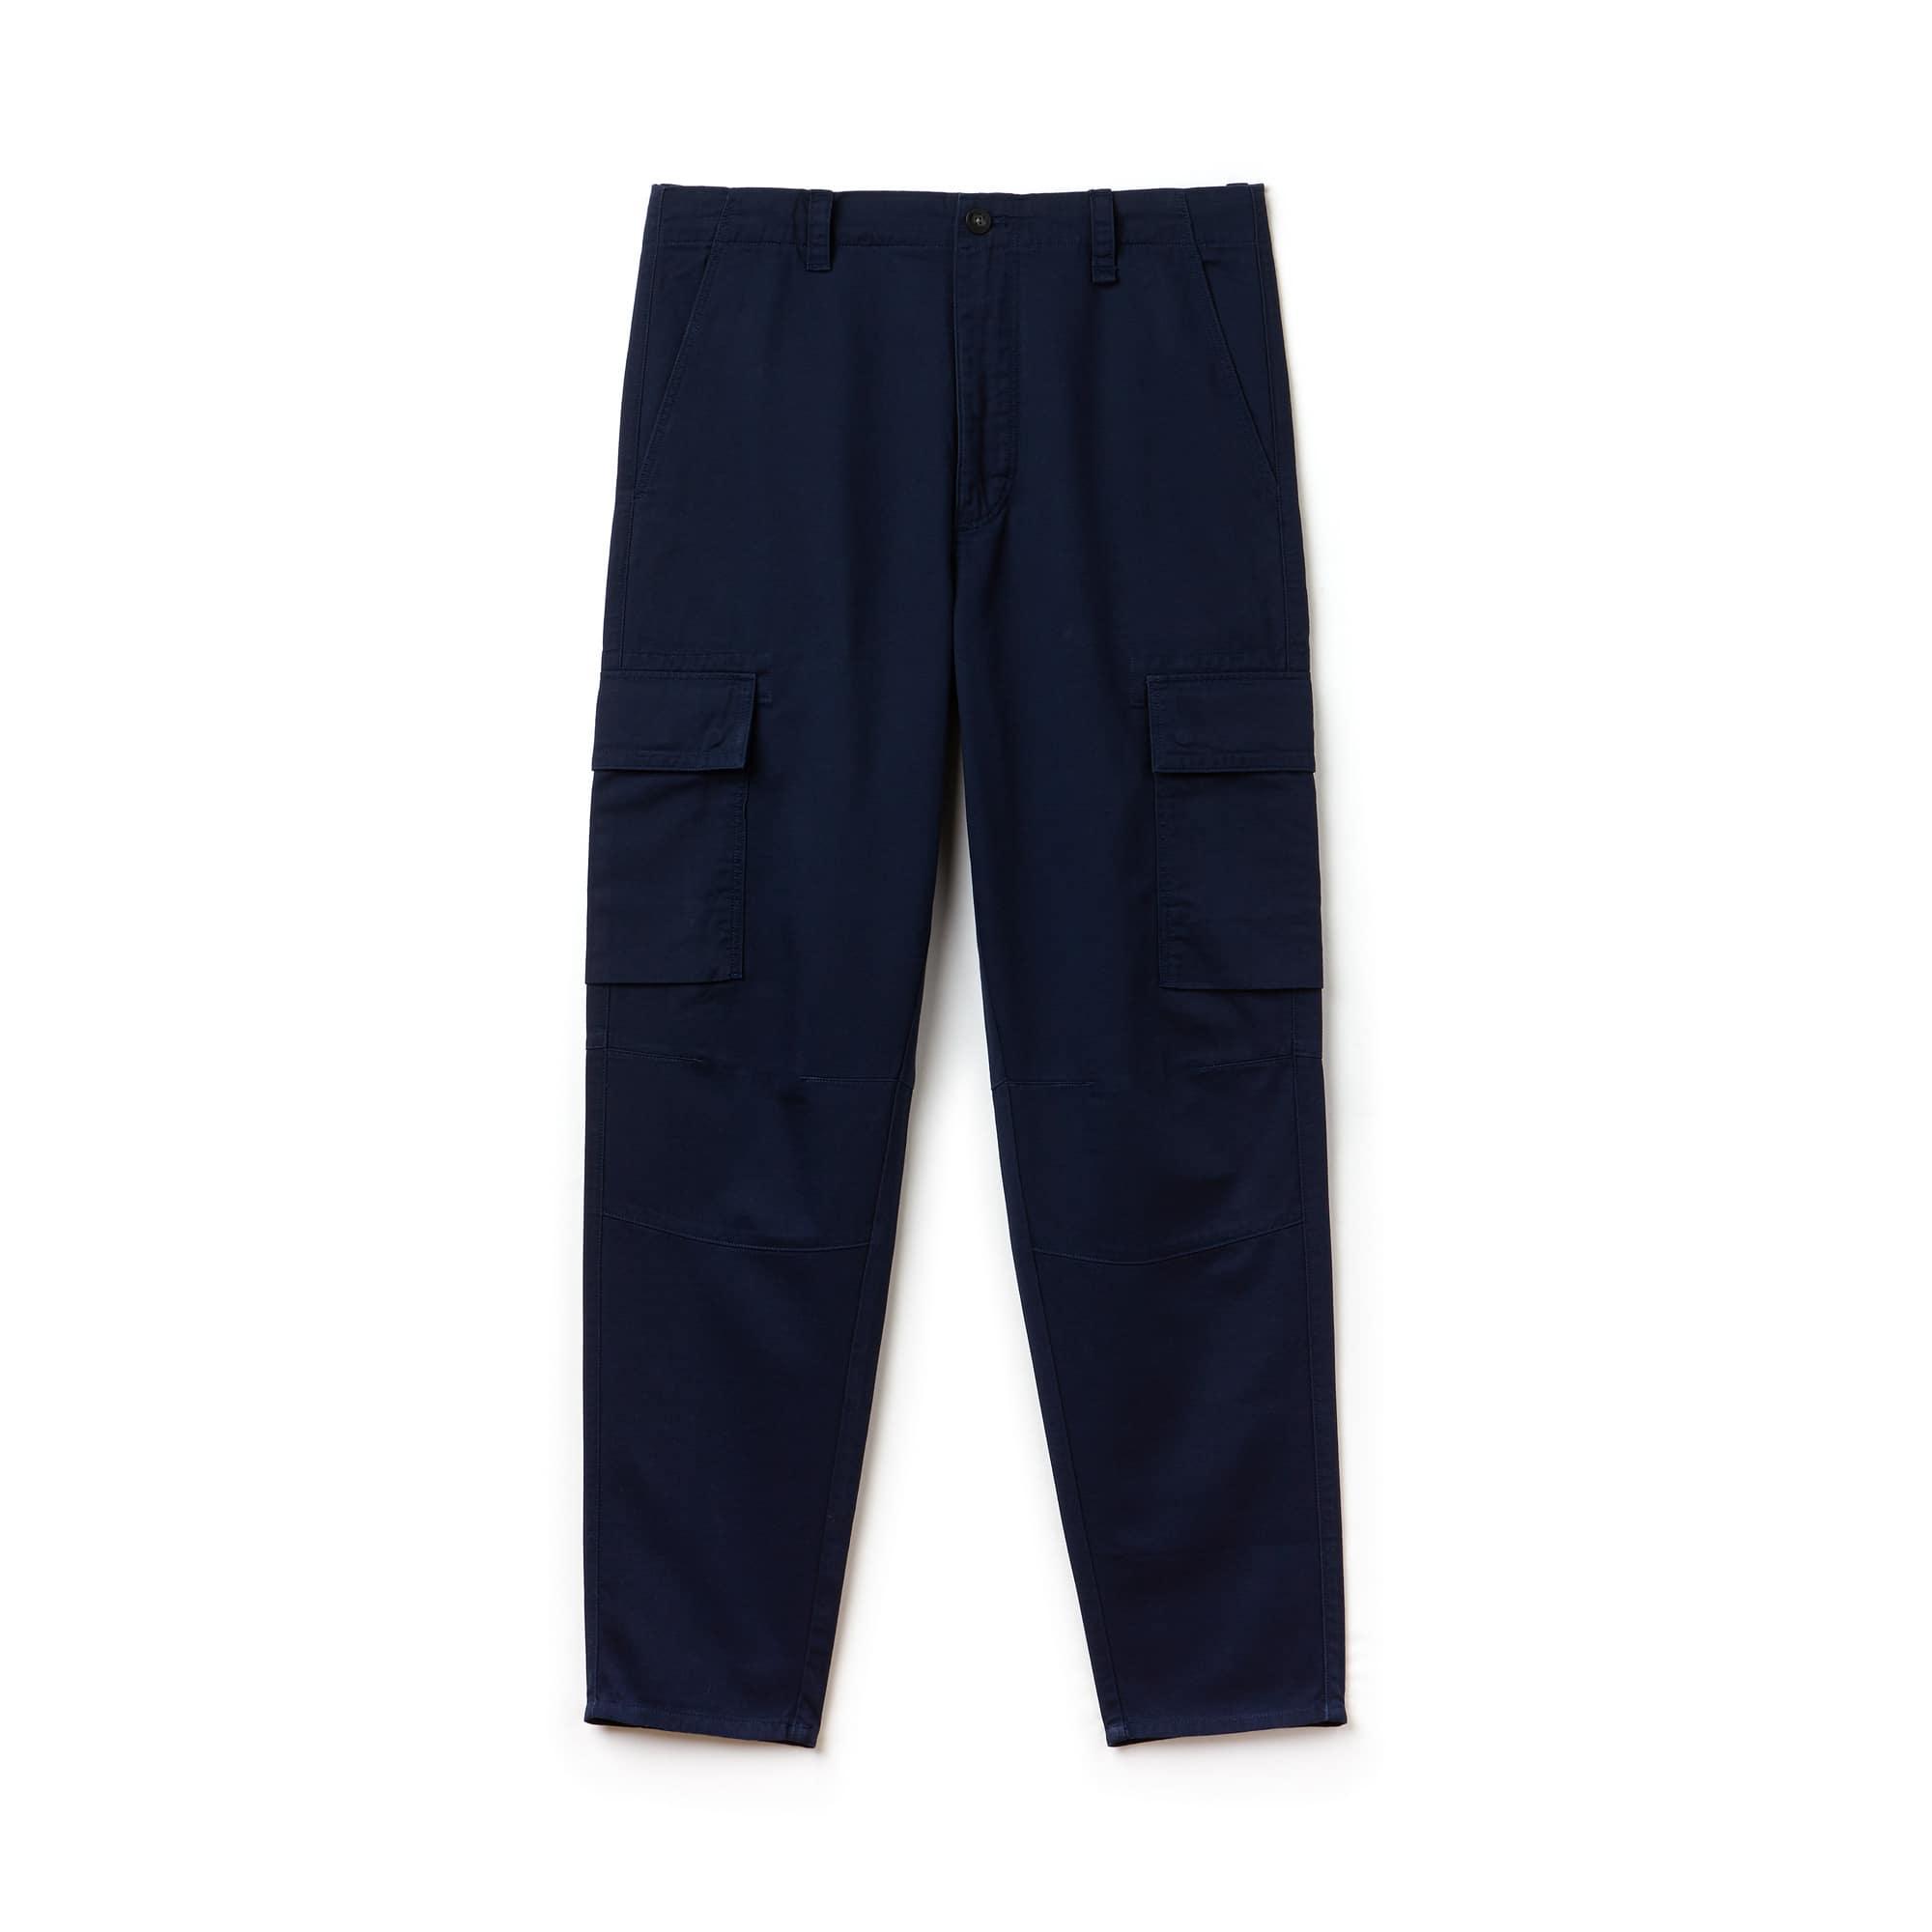 Pantalon cargo en twill de coton uni